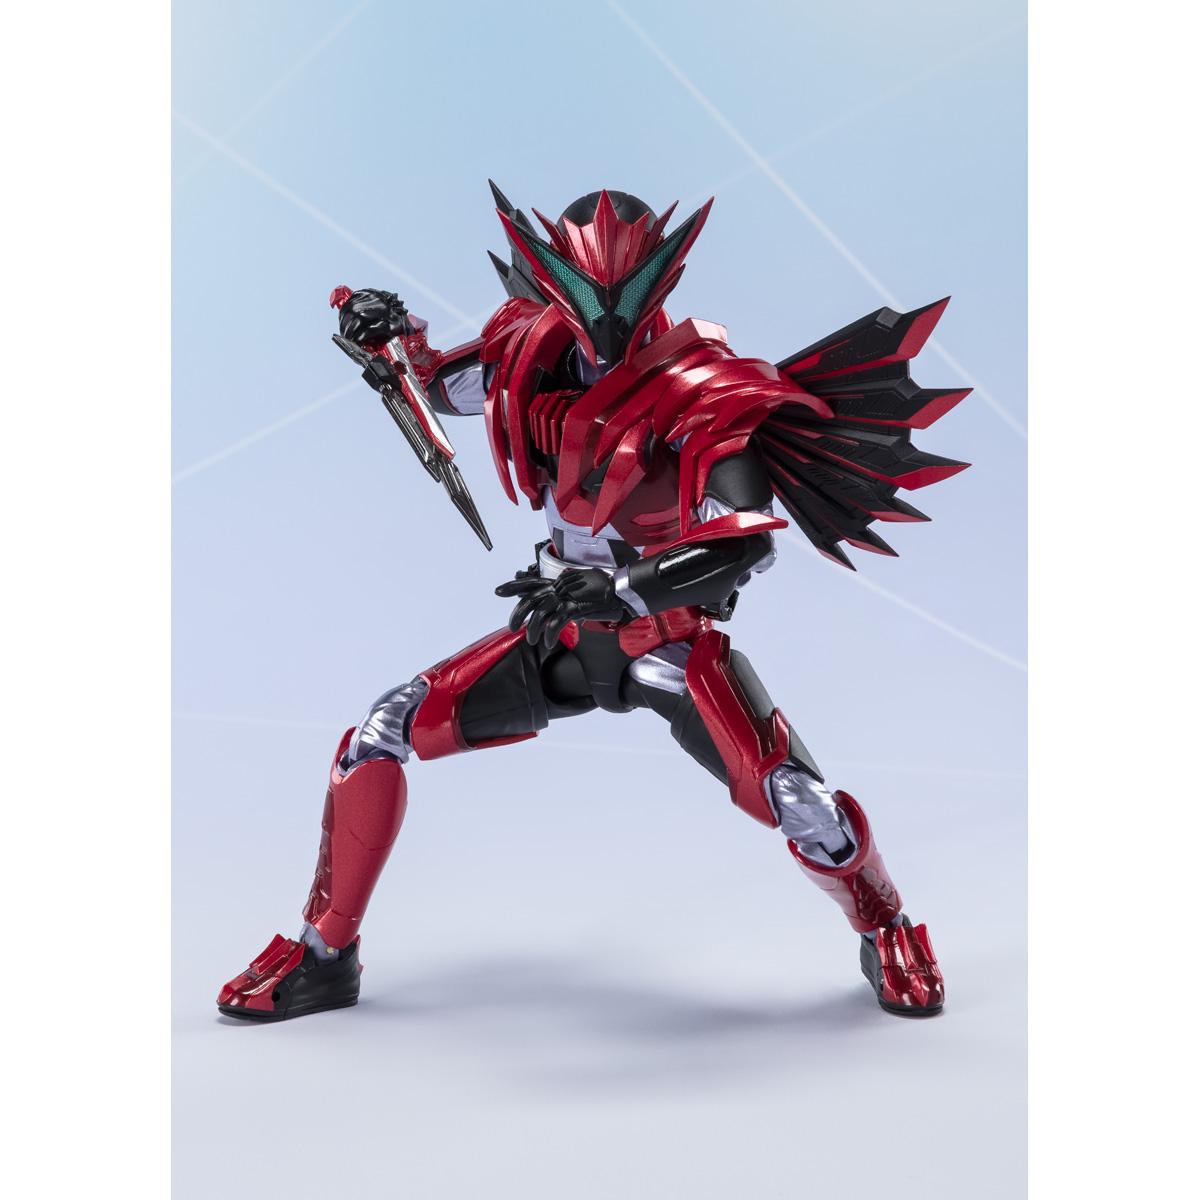 150mm Japan Pre Sale BANDAI S.H.Figuarts Kamen Rider Jin Burning Falcon Approx